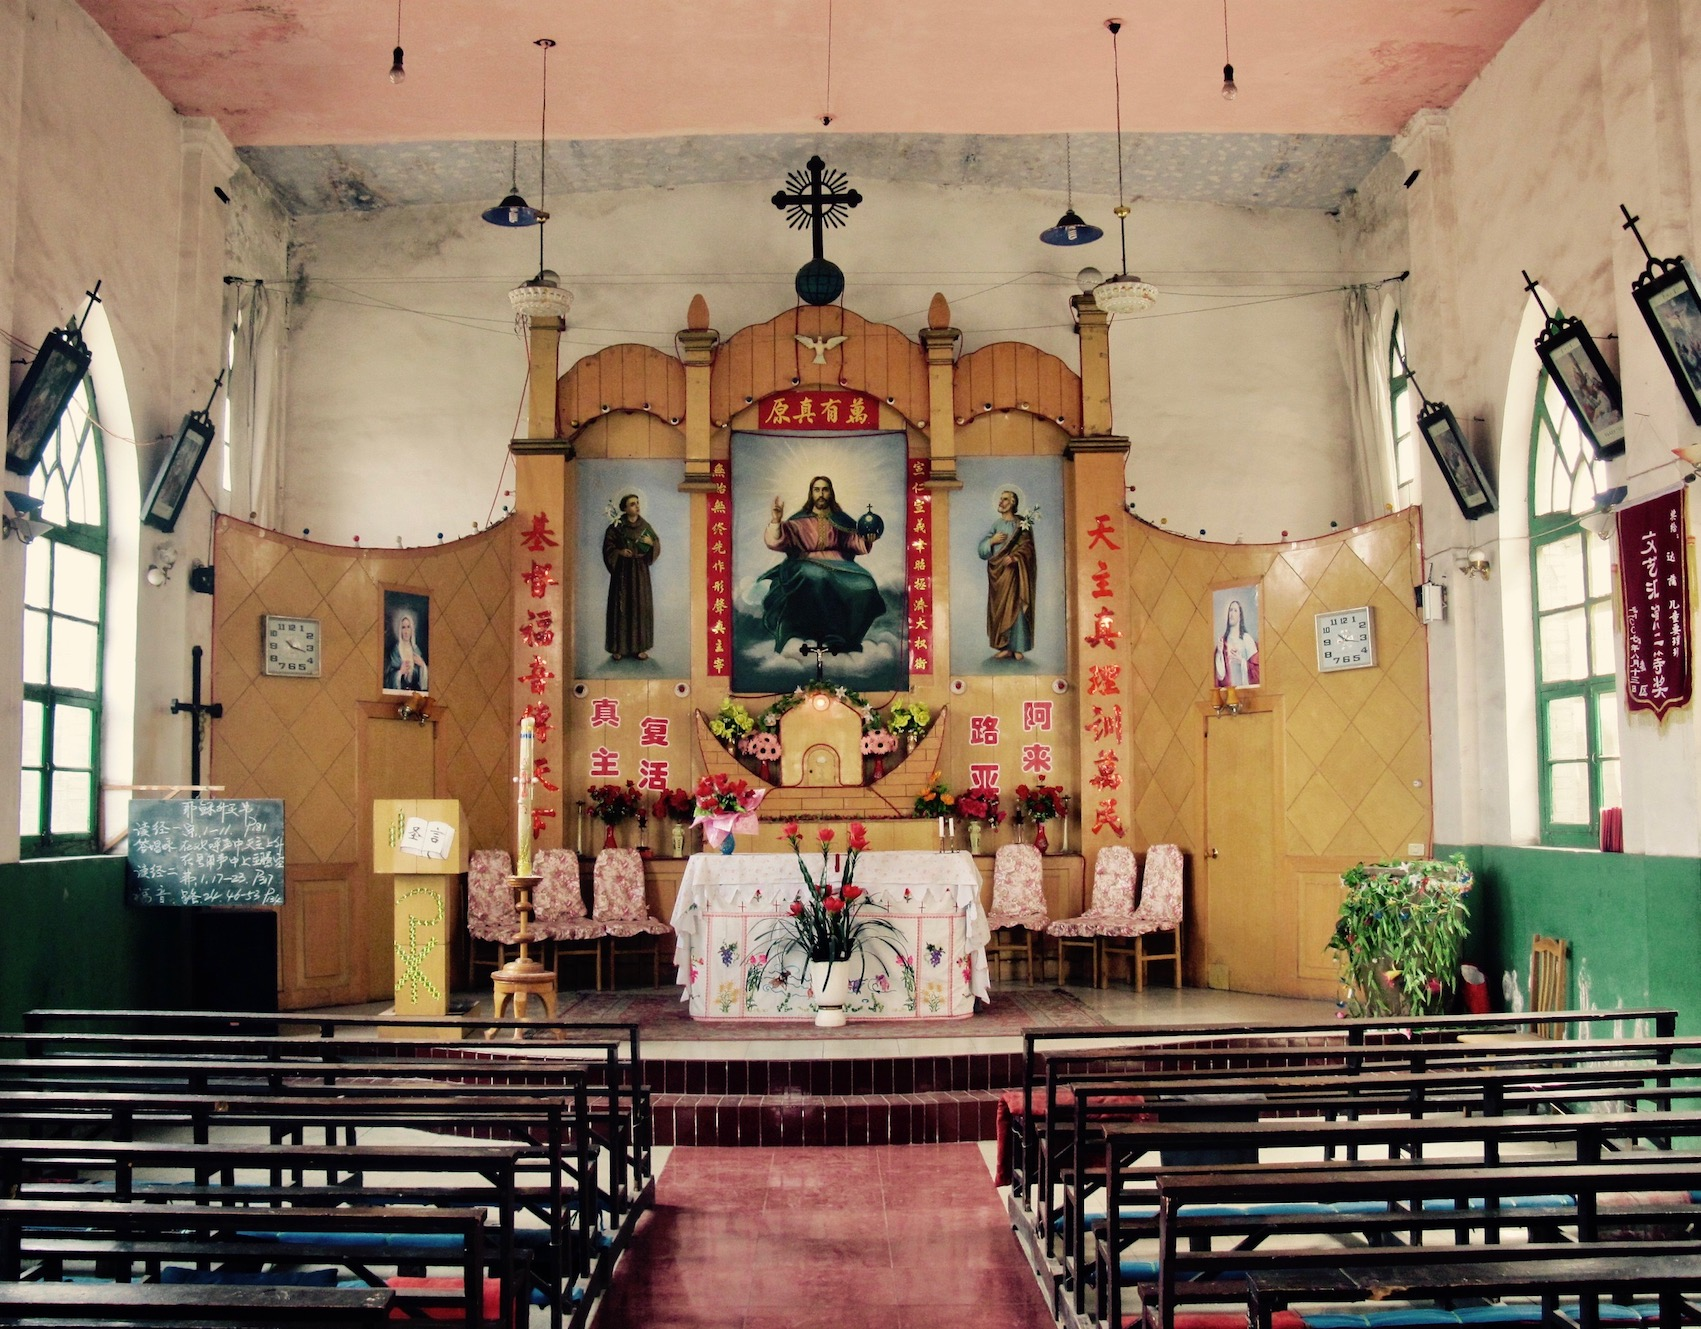 Christian church Pingyao Shanxi Province China